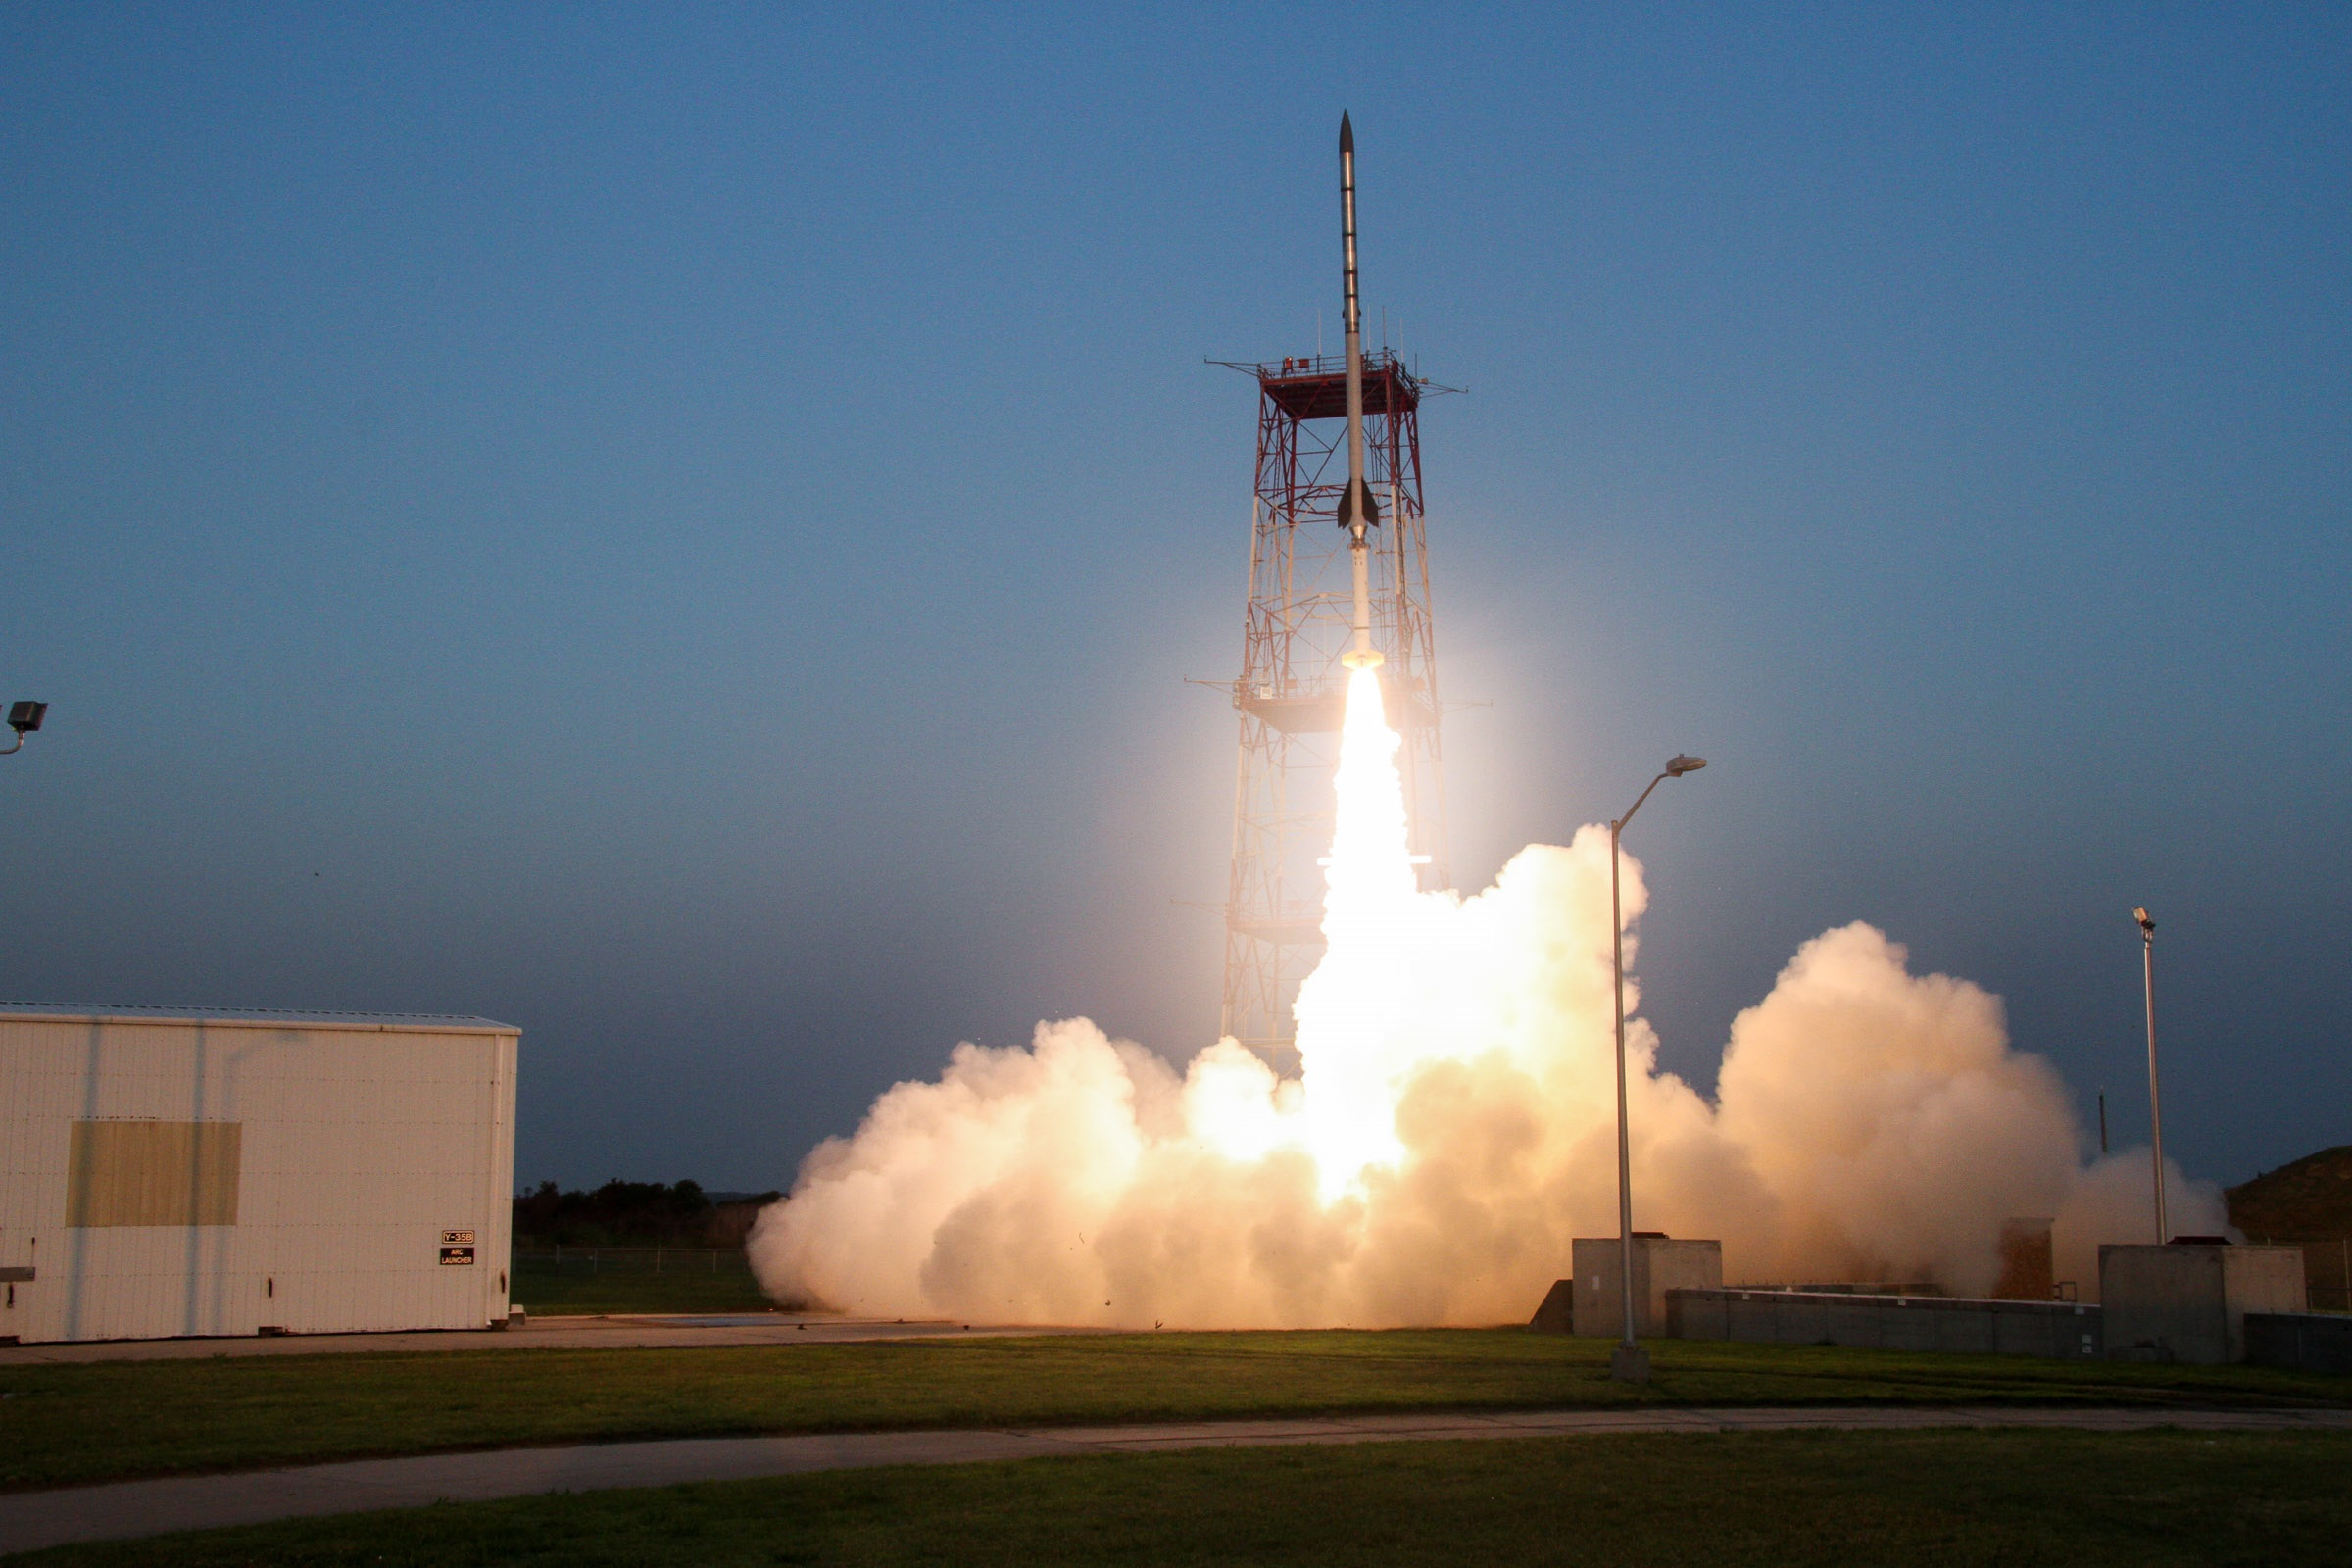 nasa landing today - photo #16